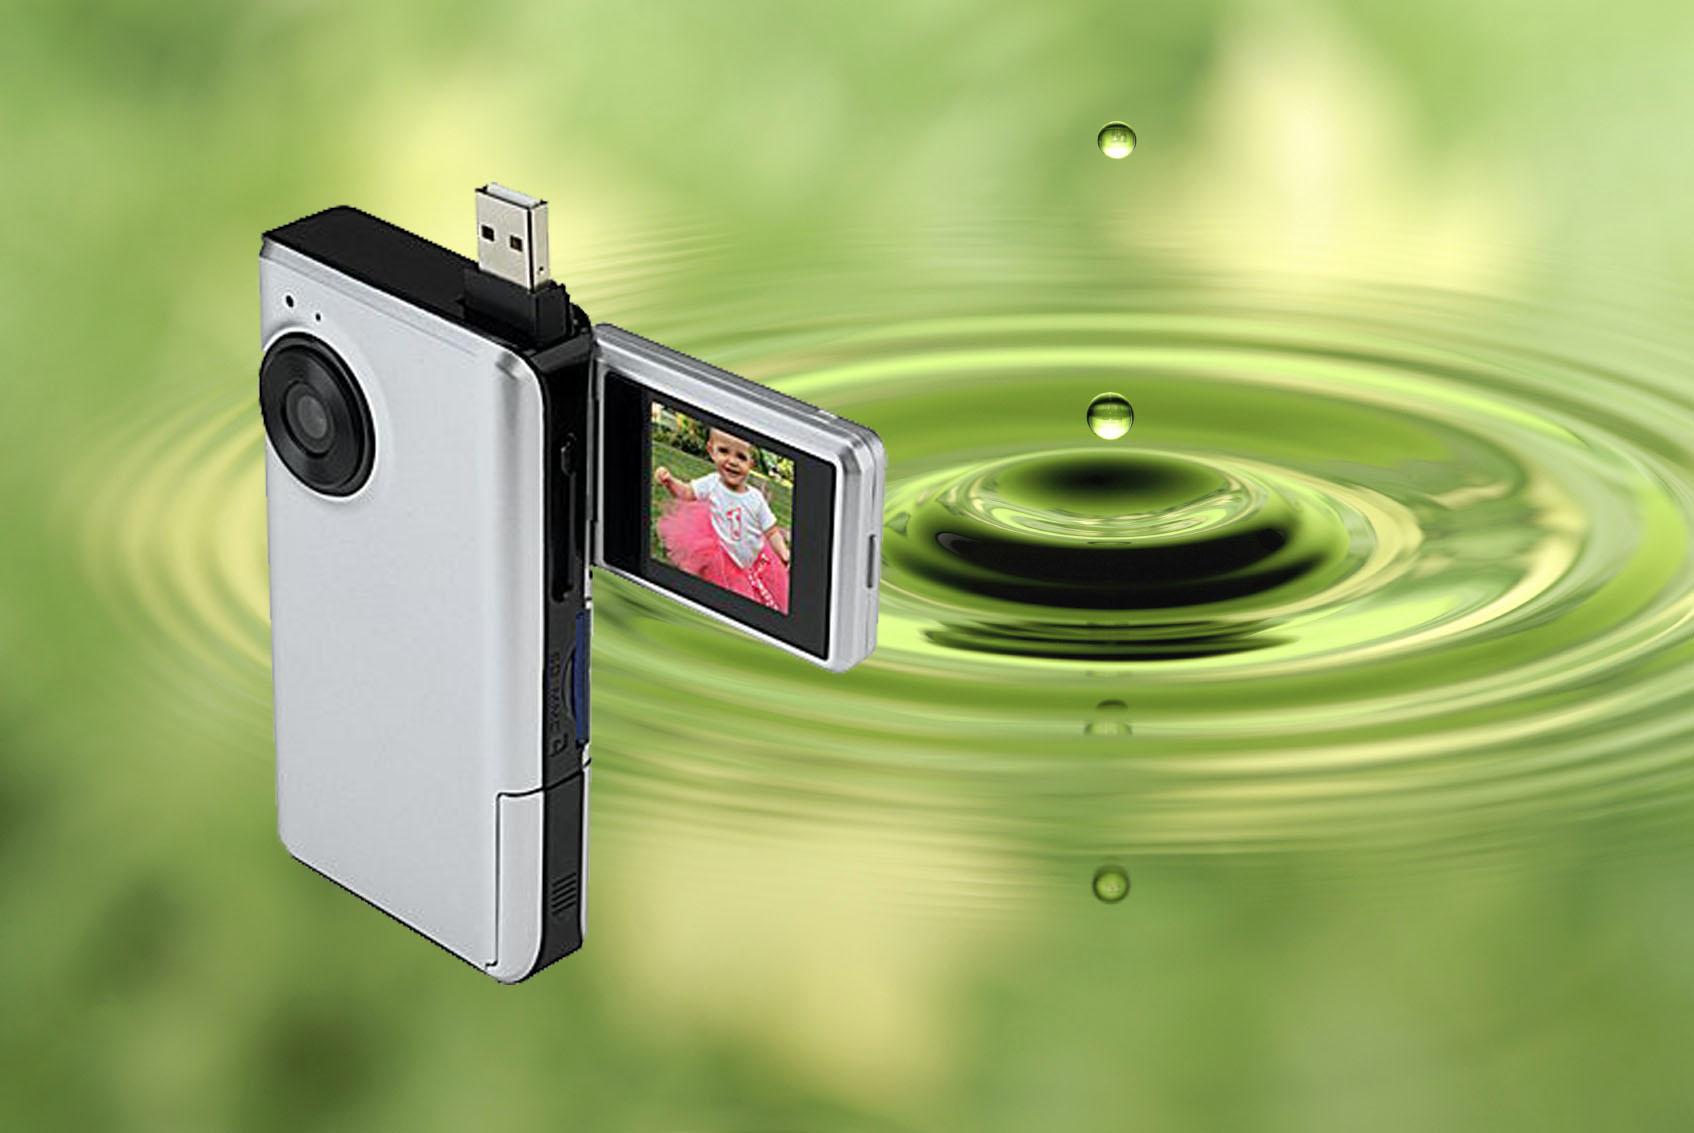 SideShot 3.0 MegaPixel USB Video Camera